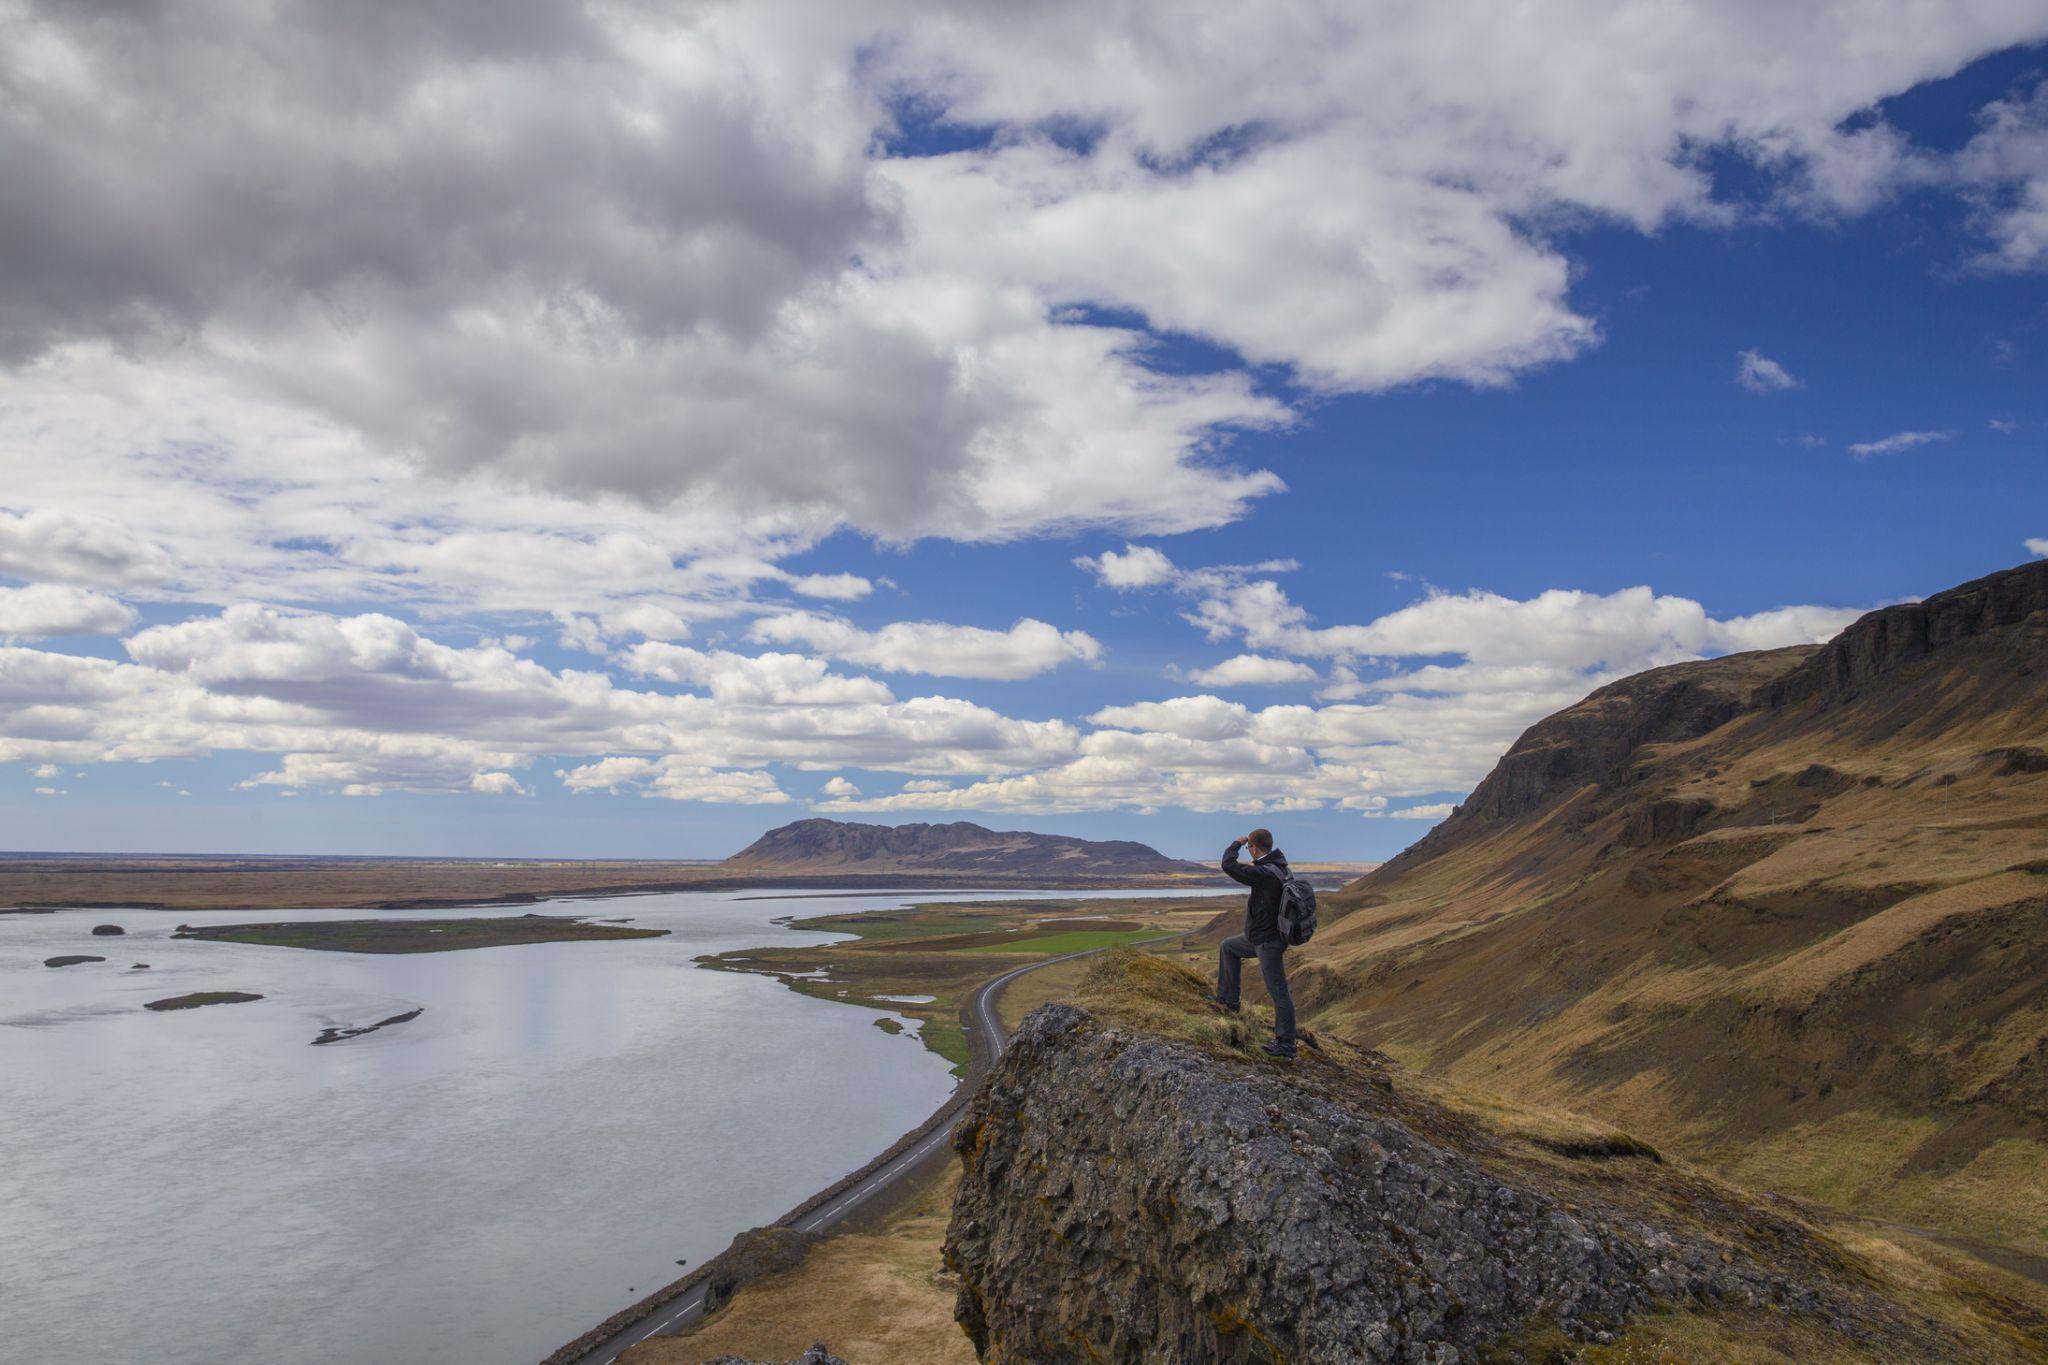 Traveler on peak of mountain in Asolfsstadhir, Iceland, Iceland